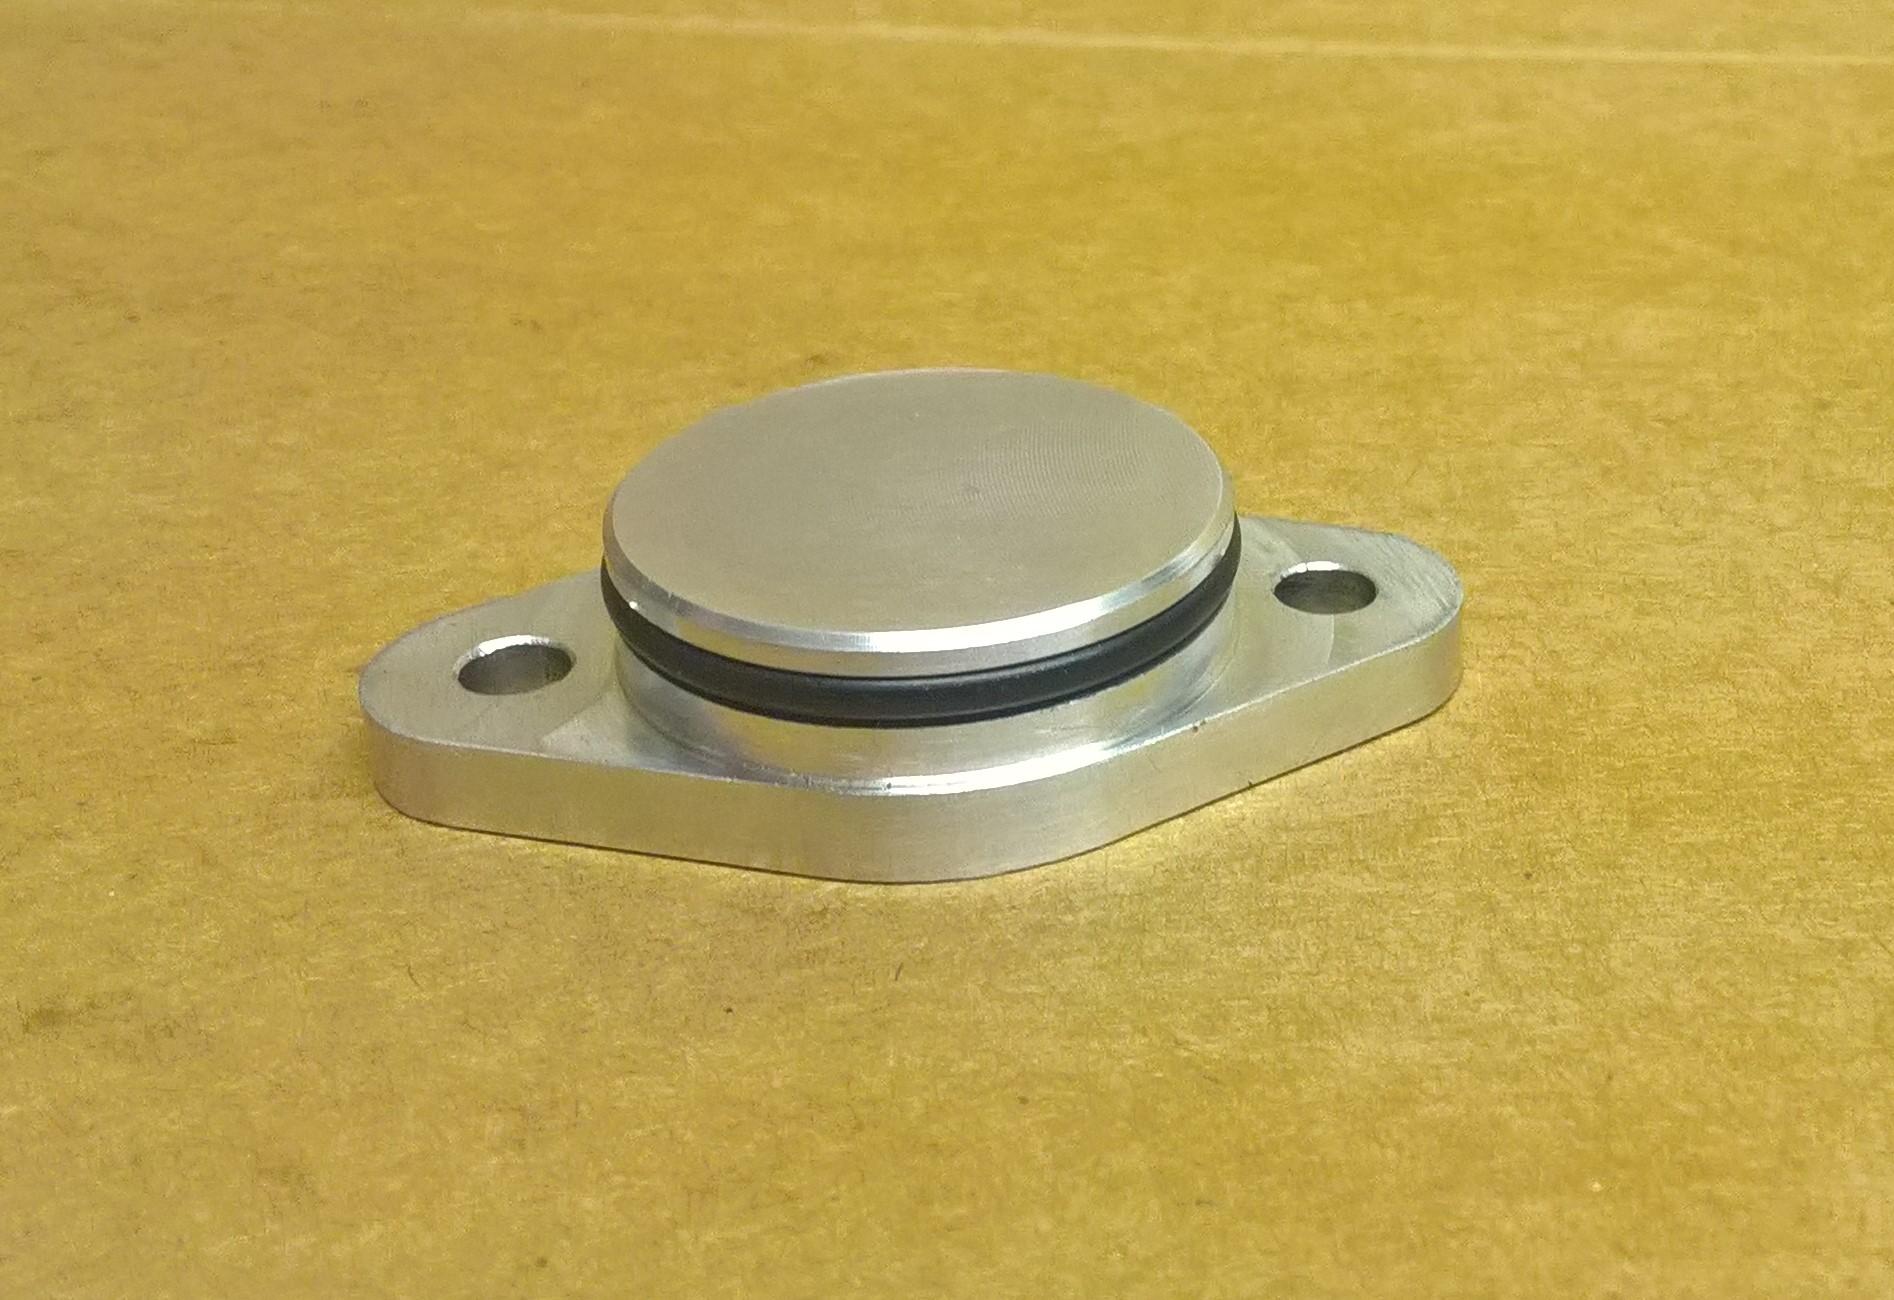 Kawasaki ZX7 Gear Position Sensor Blanking Plate Pic 1